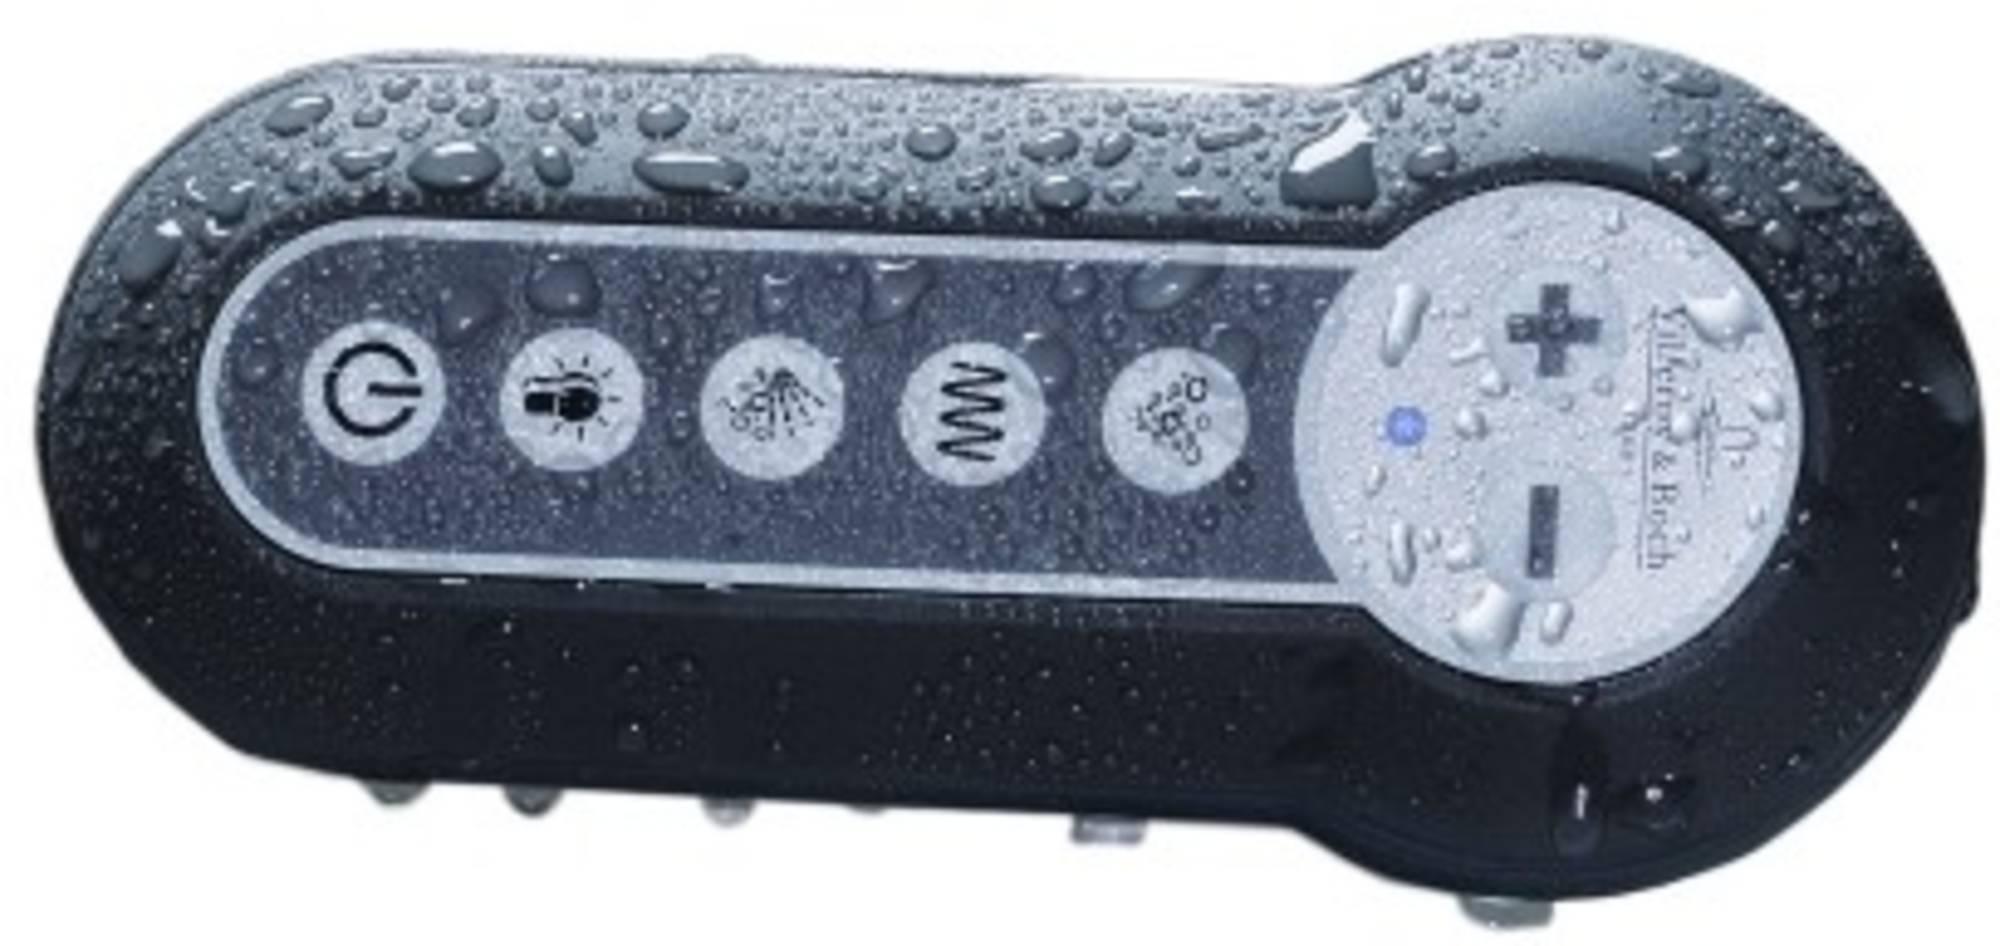 Villeroy&Boch Comfort Control afstandbediening voor whisper whirlpool